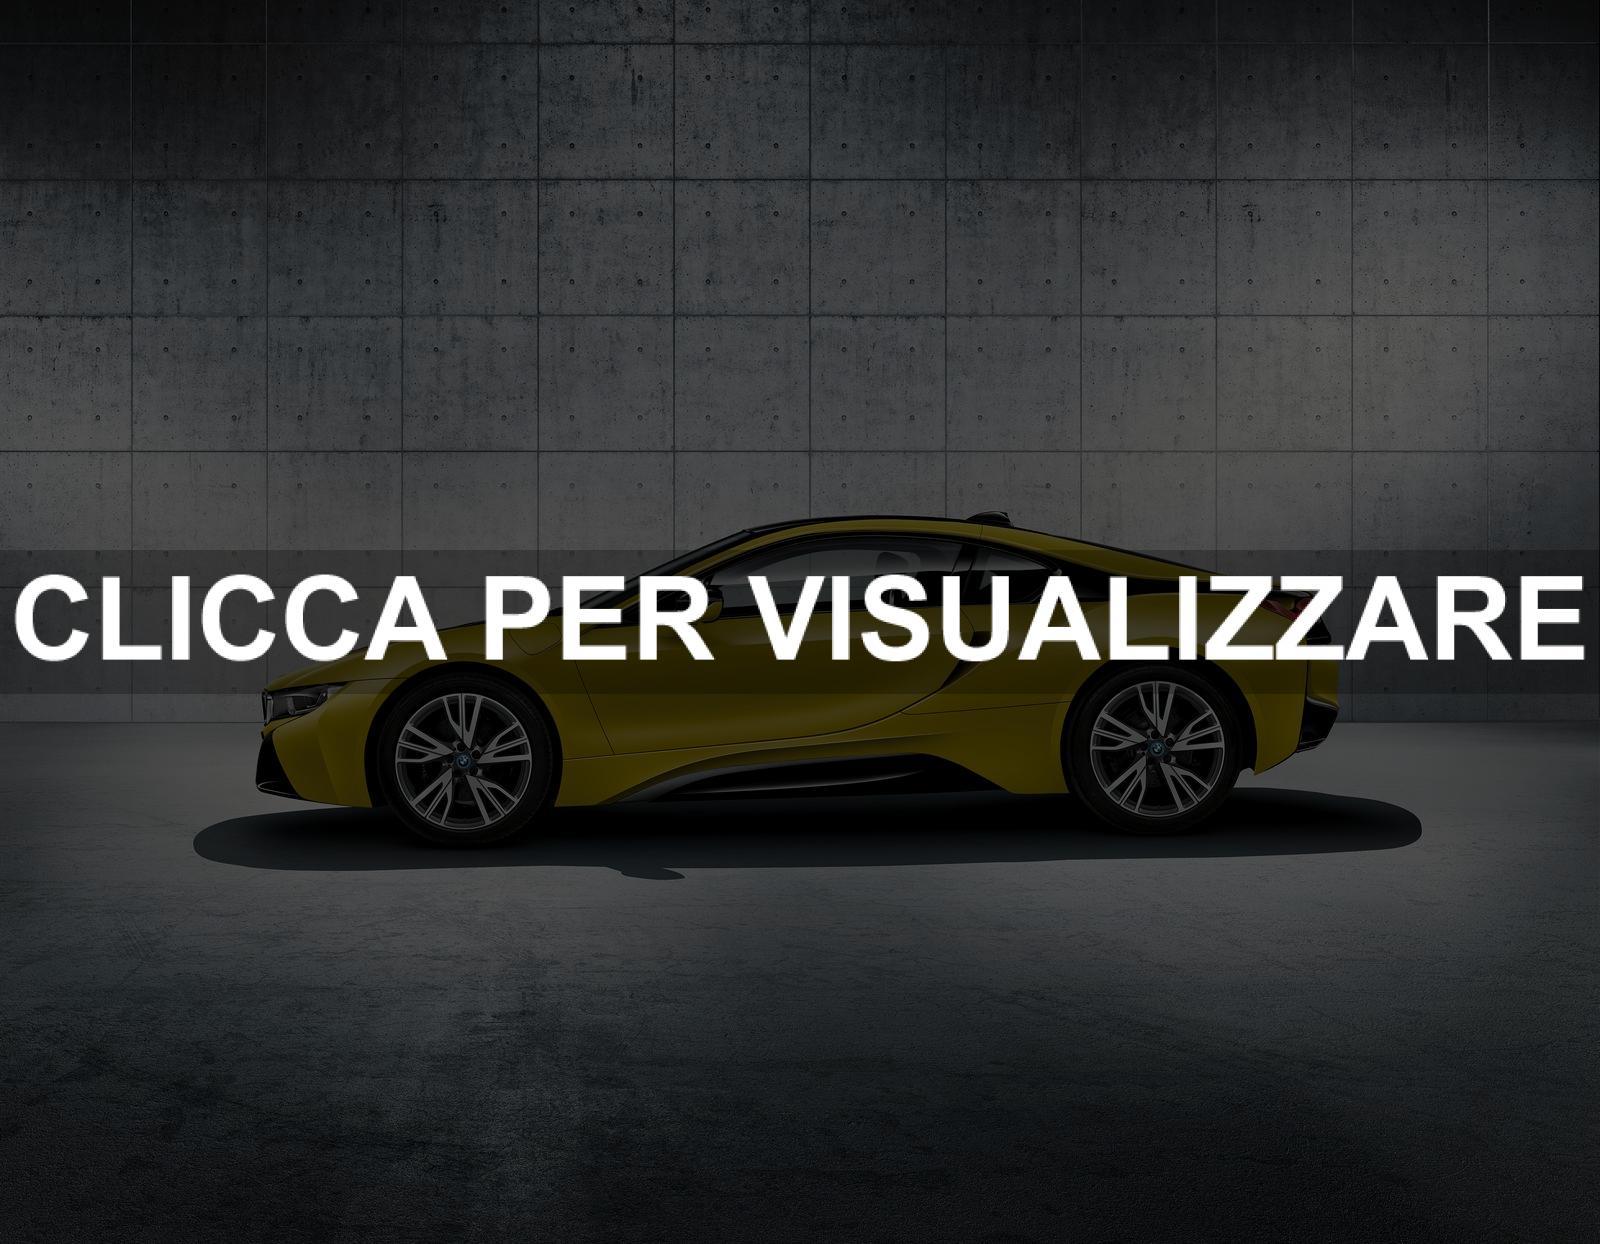 Immagine fiancata nuova ibrida BMW i8 Frozen Protonic Yellow Edition 2017